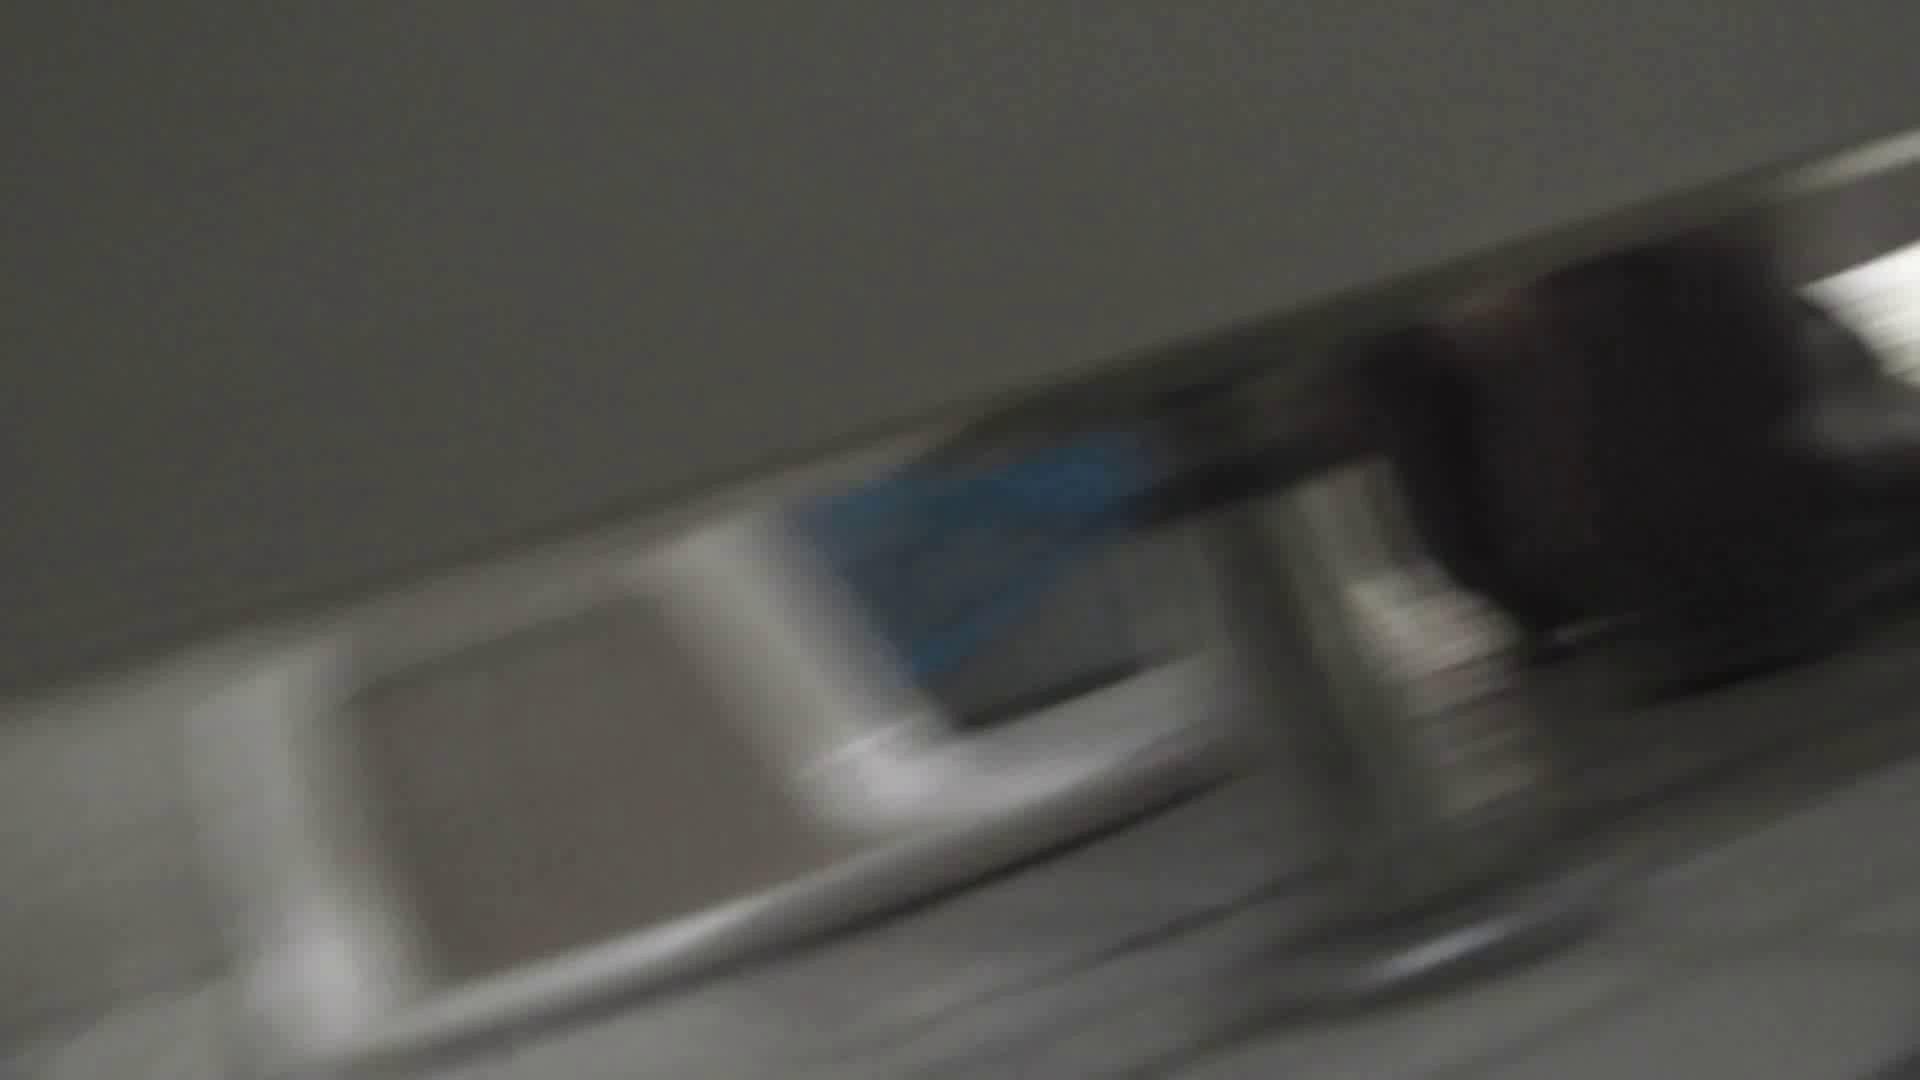 vol.25三十時間潜り、一つしか出会えない完璧桃尻編 byお銀 美人   洗面所  96pic 91